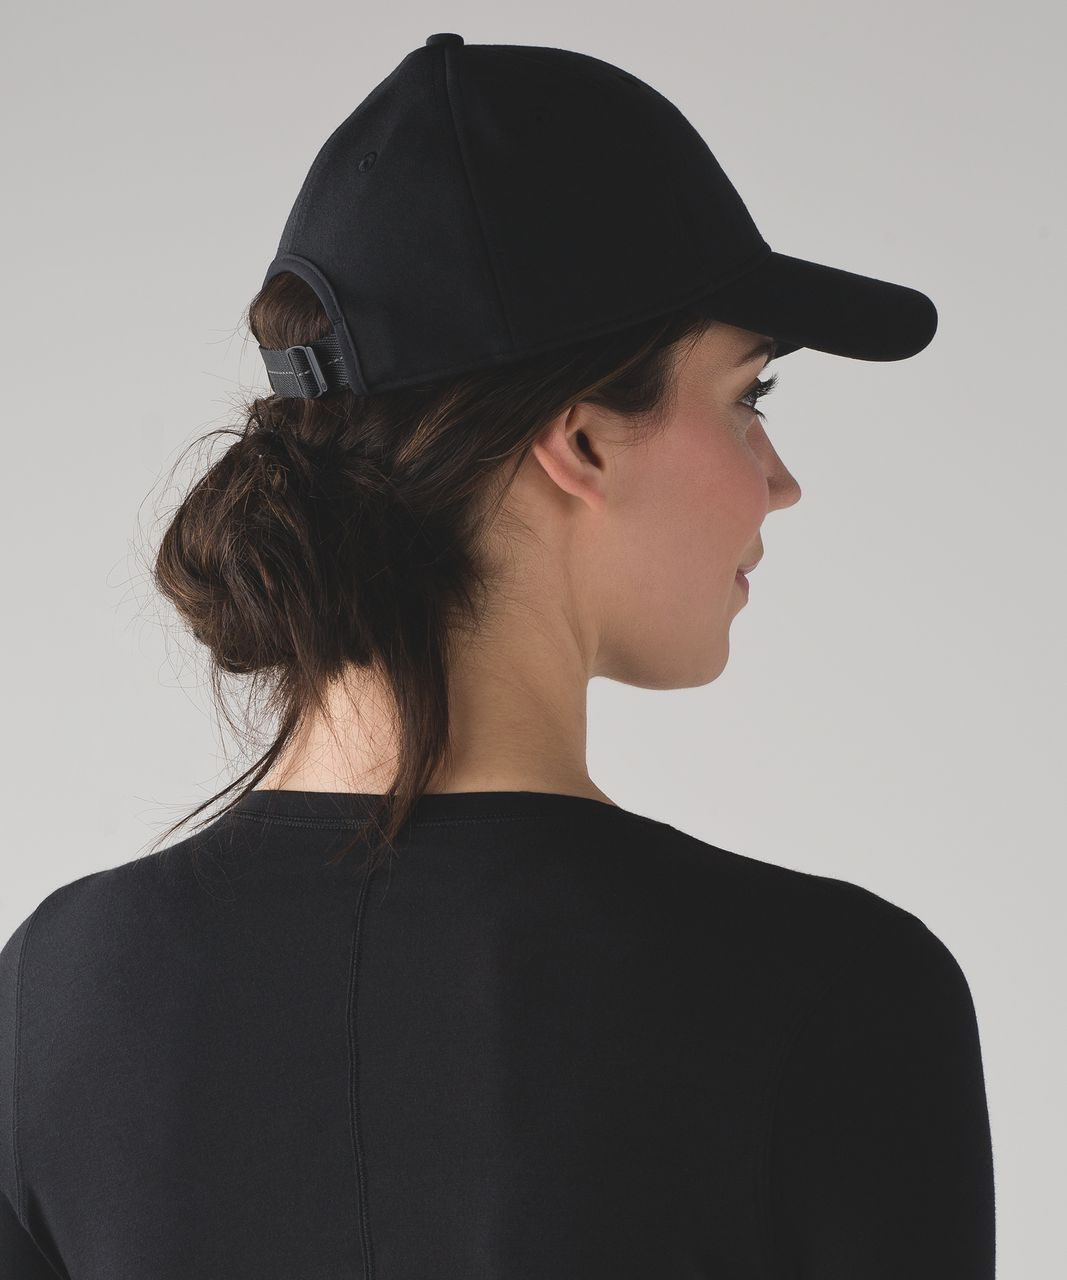 Lululemon Baller Hat - Black (Second Release)